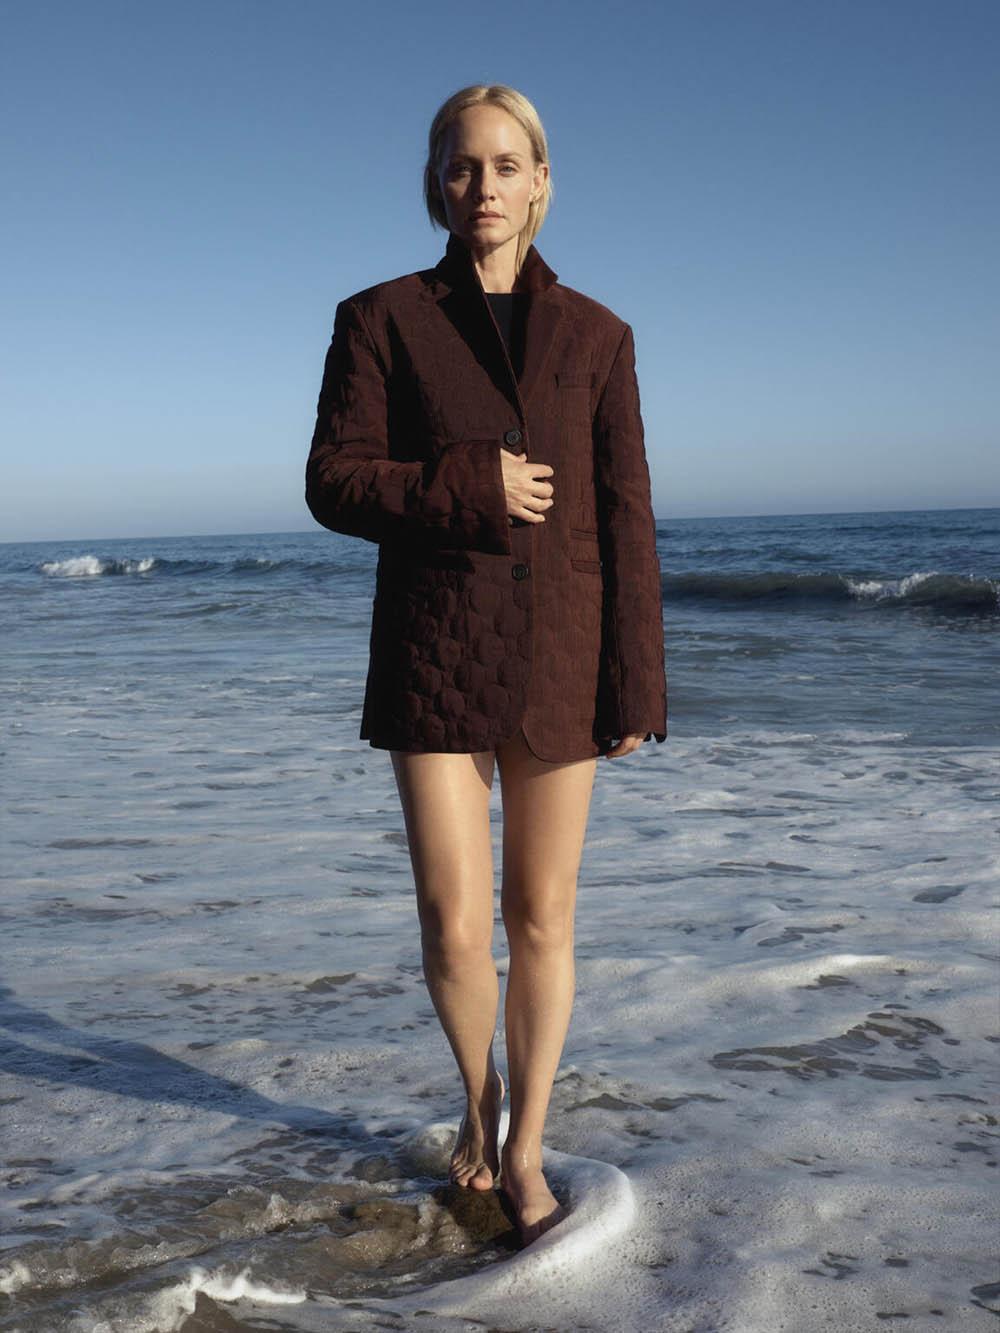 Amber Valletta by Zoë Ghertner for British Vogue November 2020